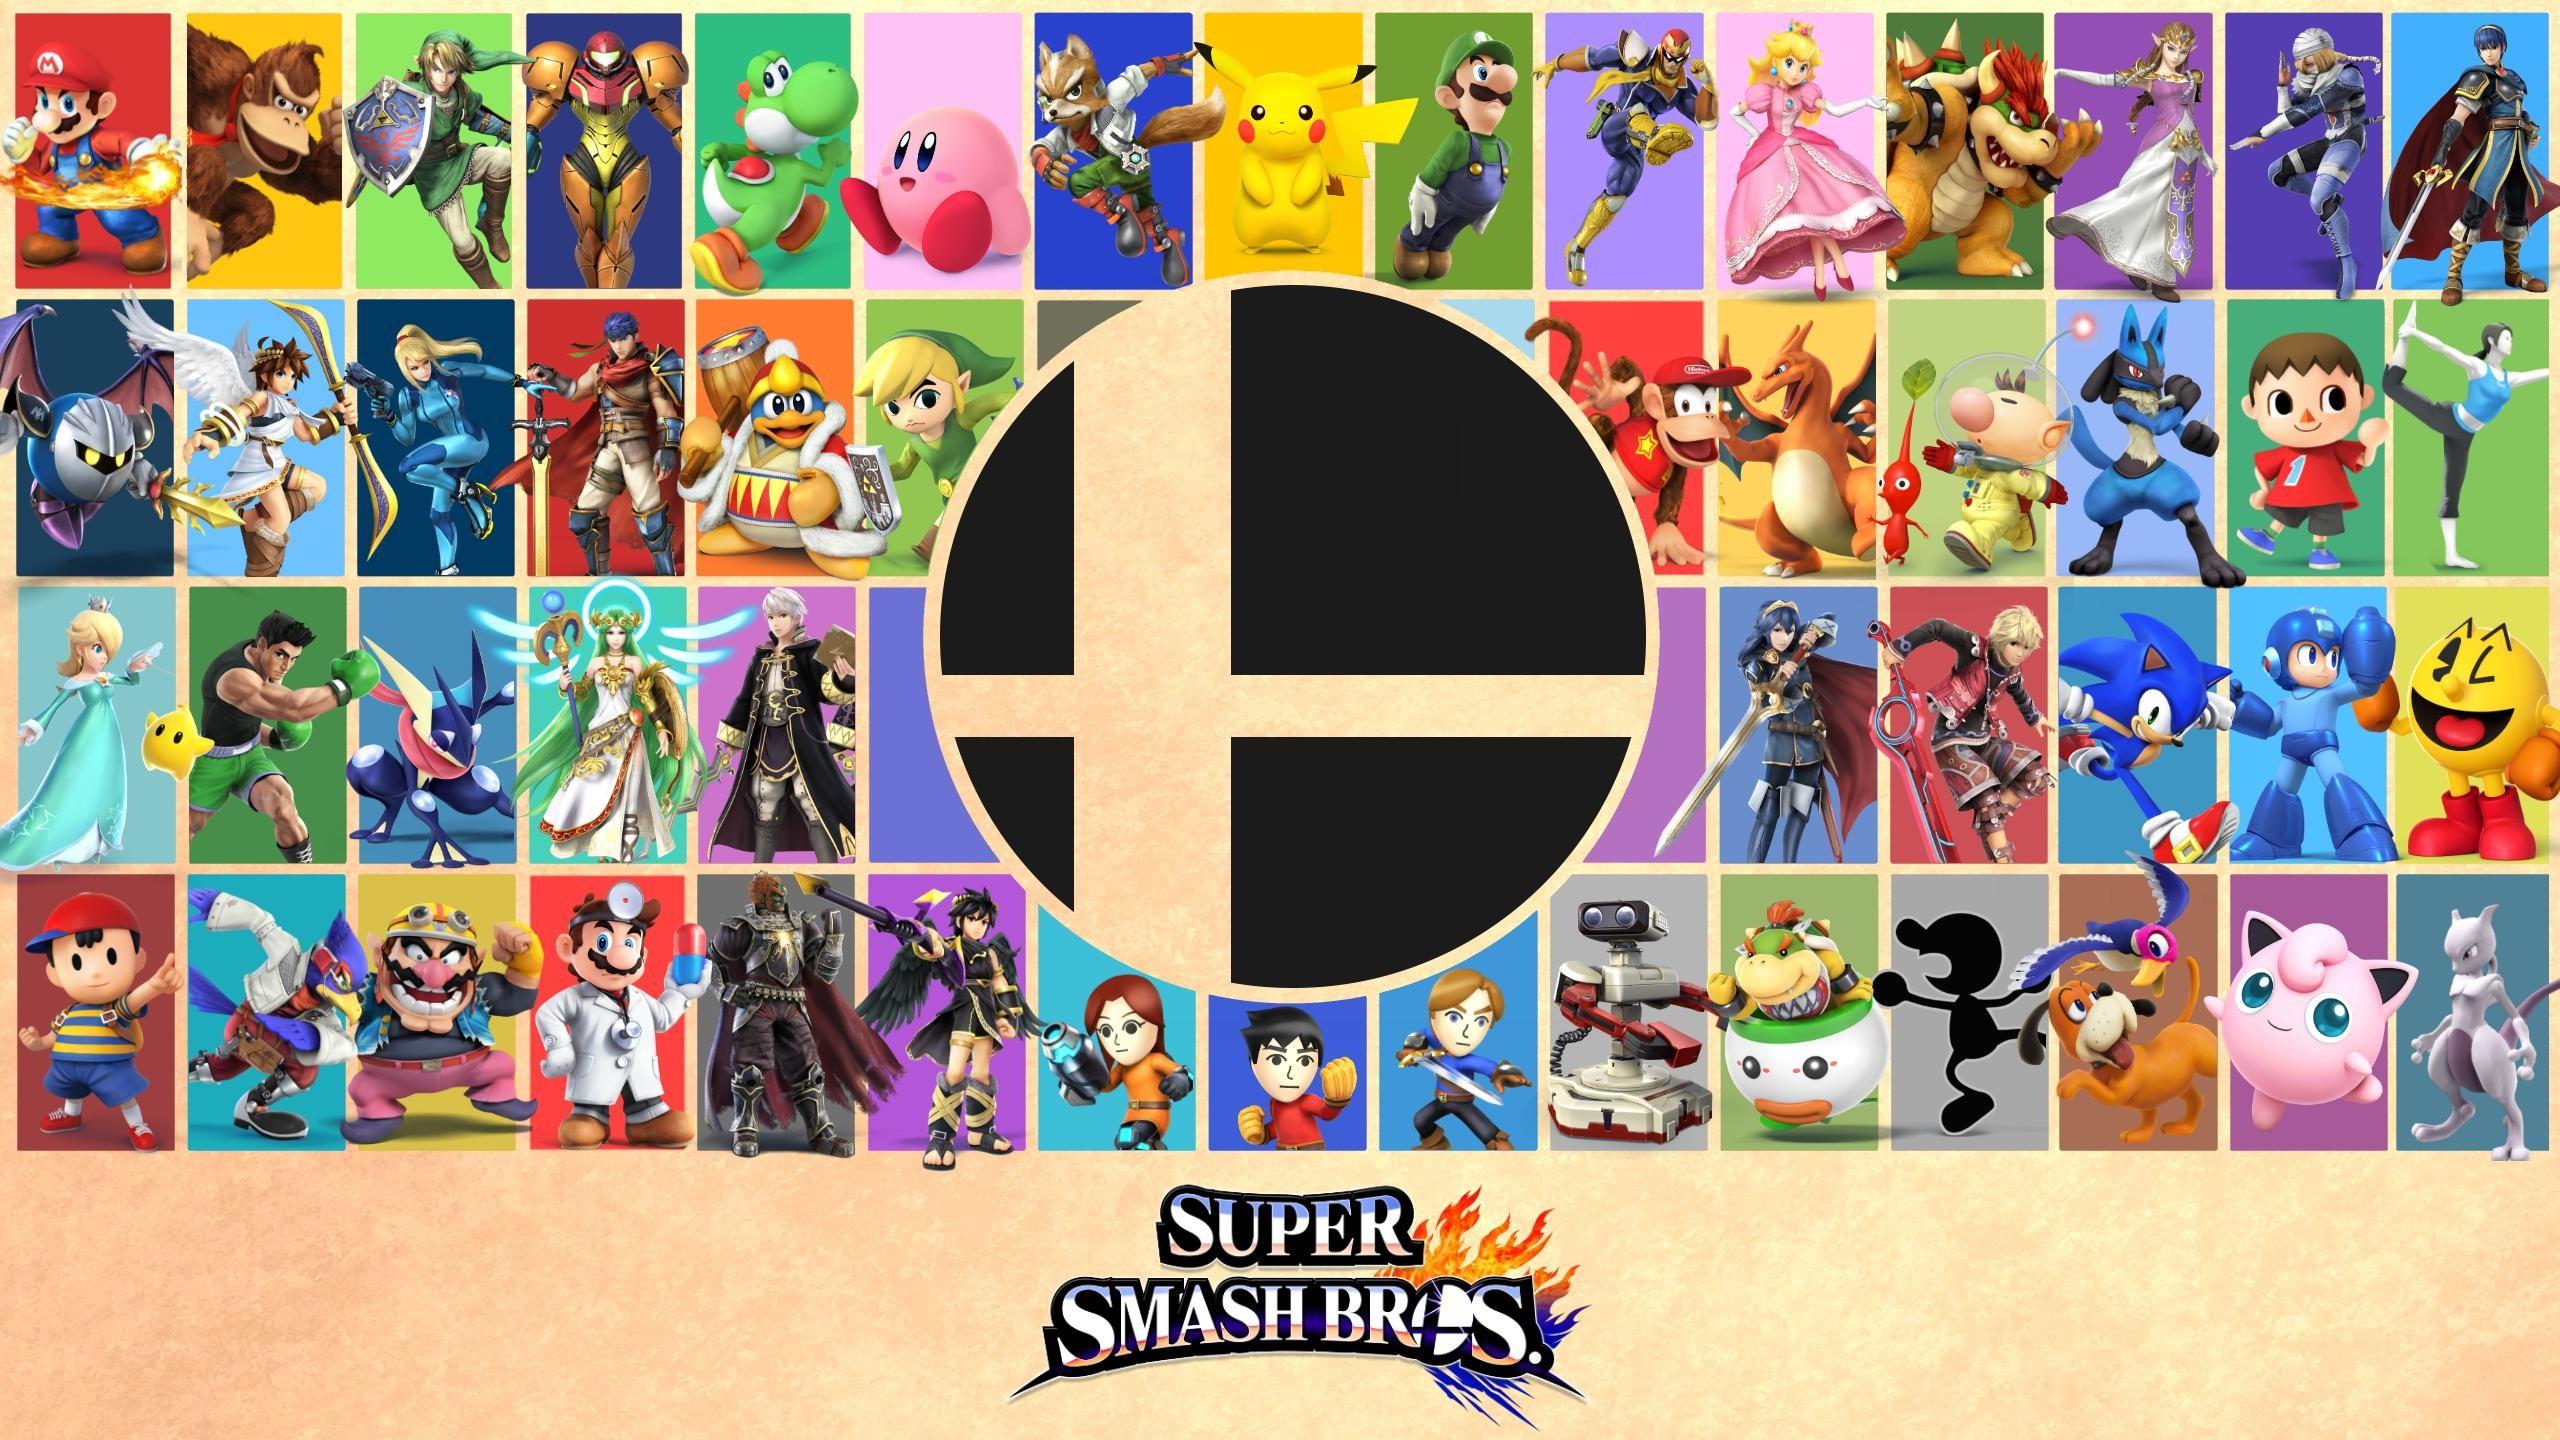 Smash Bros Iphone Wallpaper 84 Images